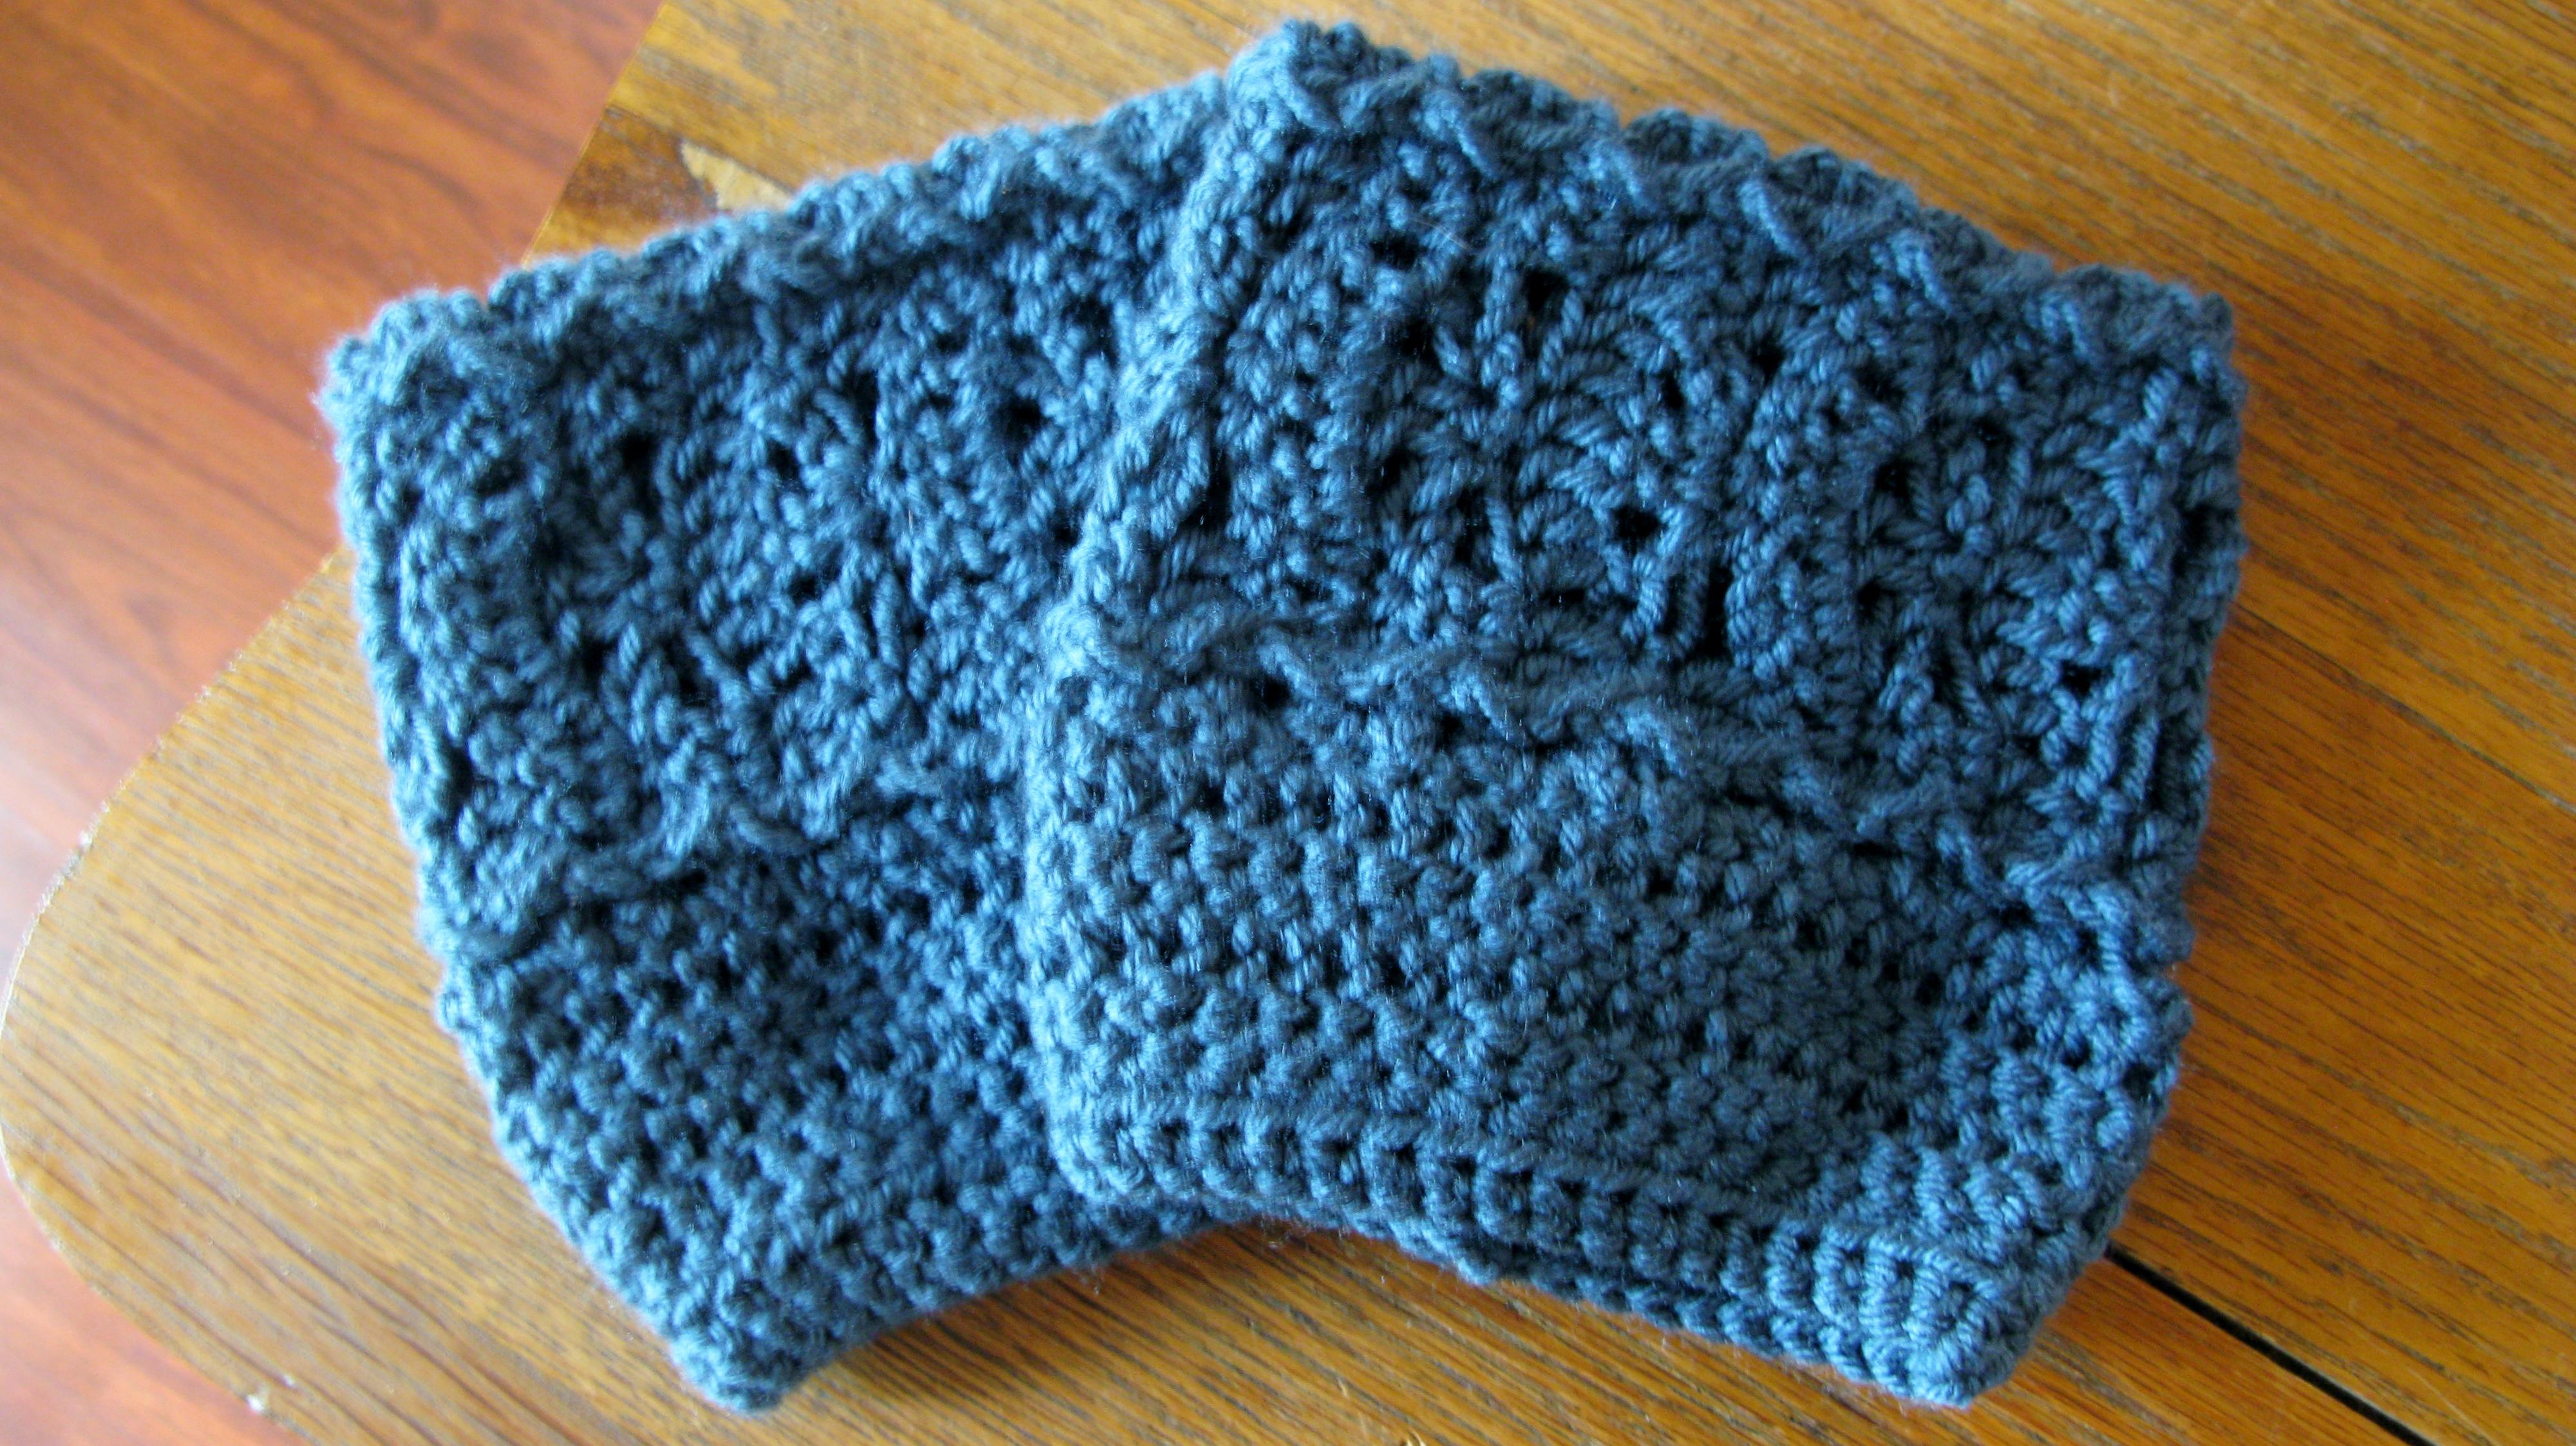 Do You Dream of More? - ELK Studio - Handcrafted Crochet Designs